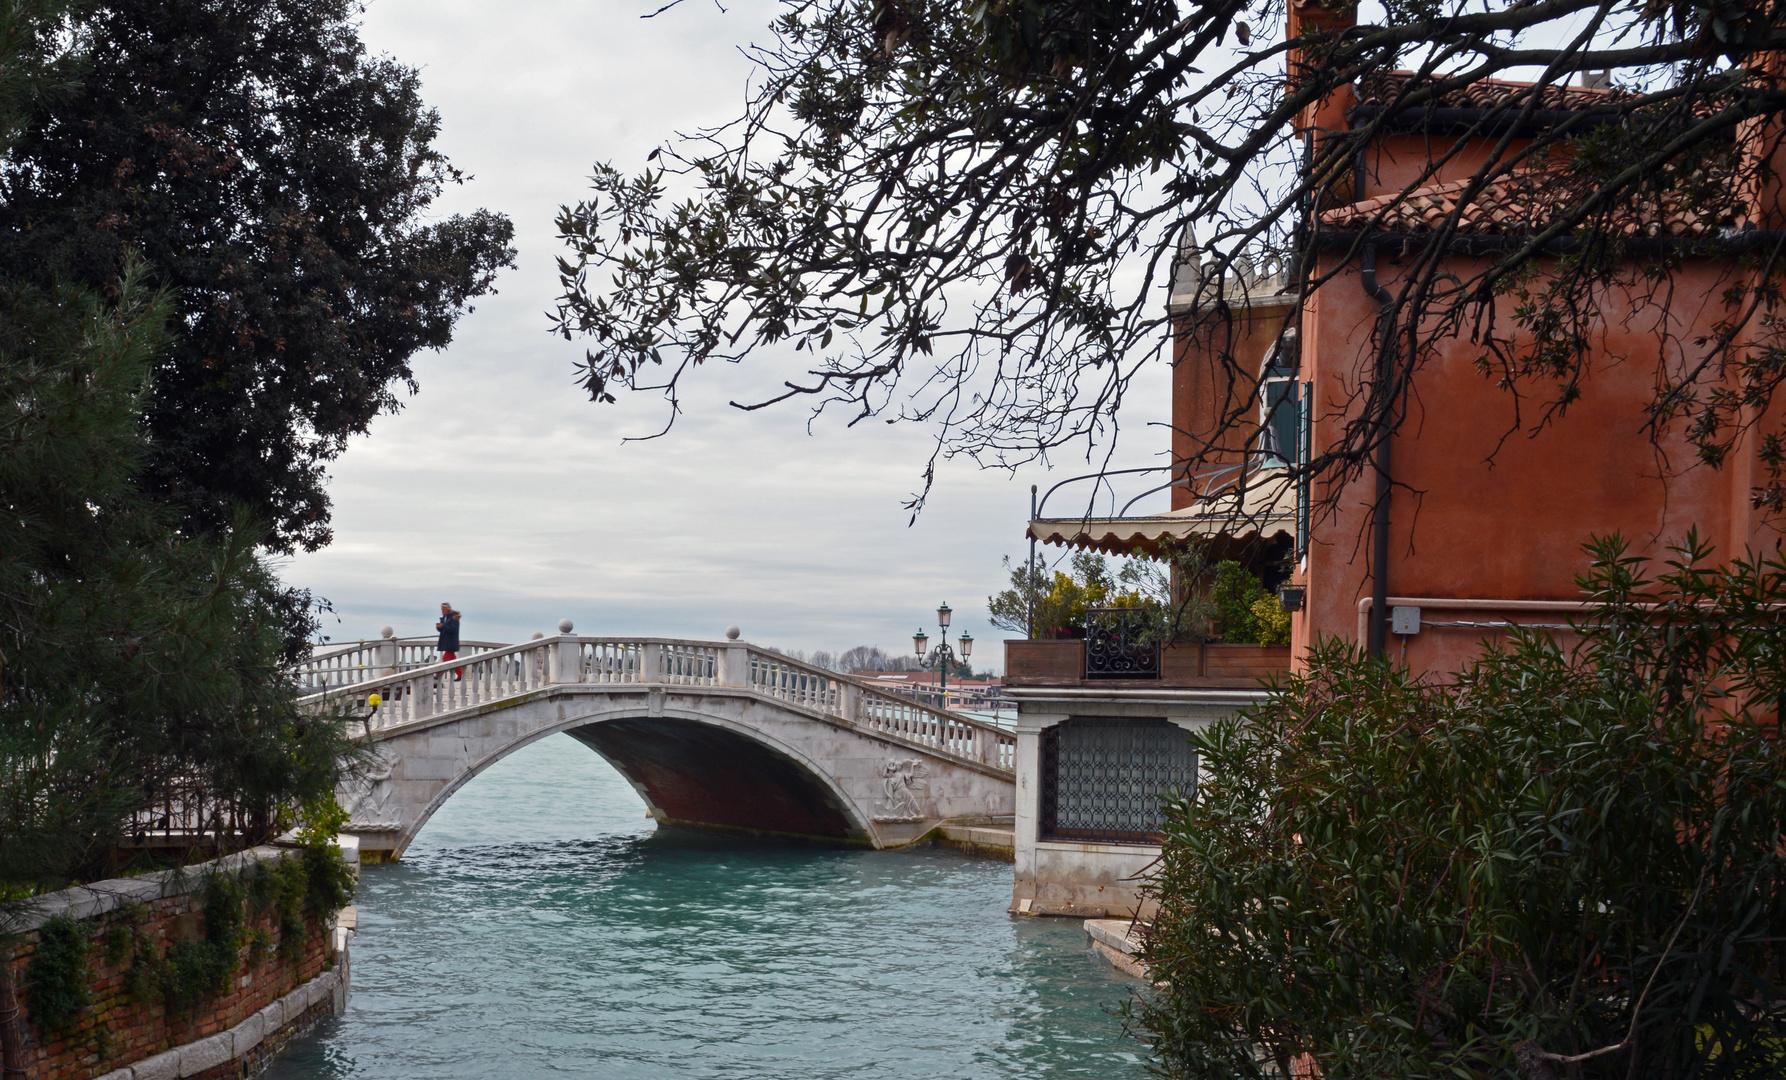 The bridge on Venice